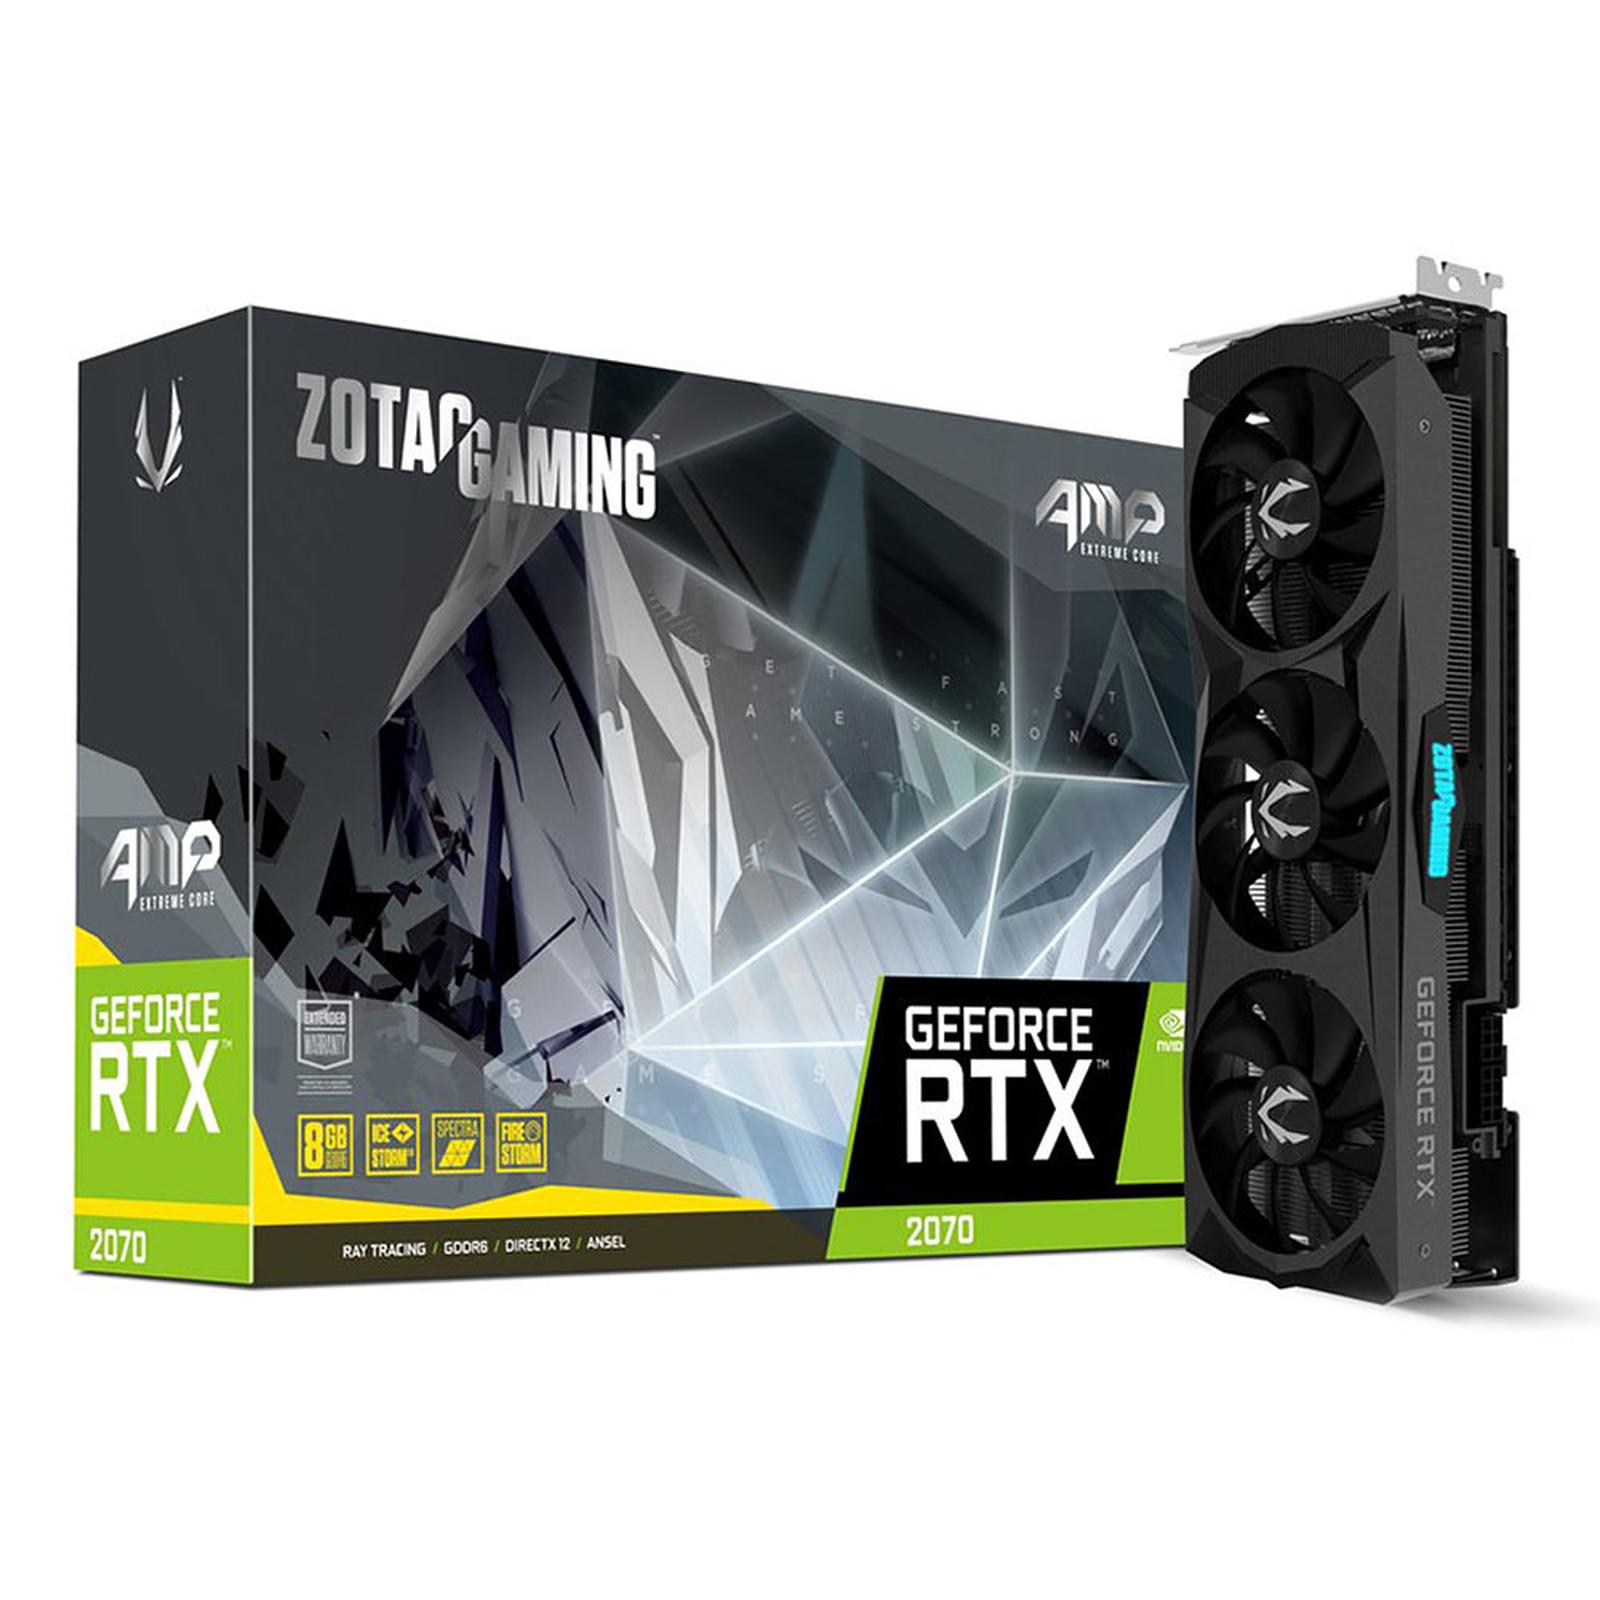 ZOTAC GeForce RTX 2070 AMP! Extreme Core